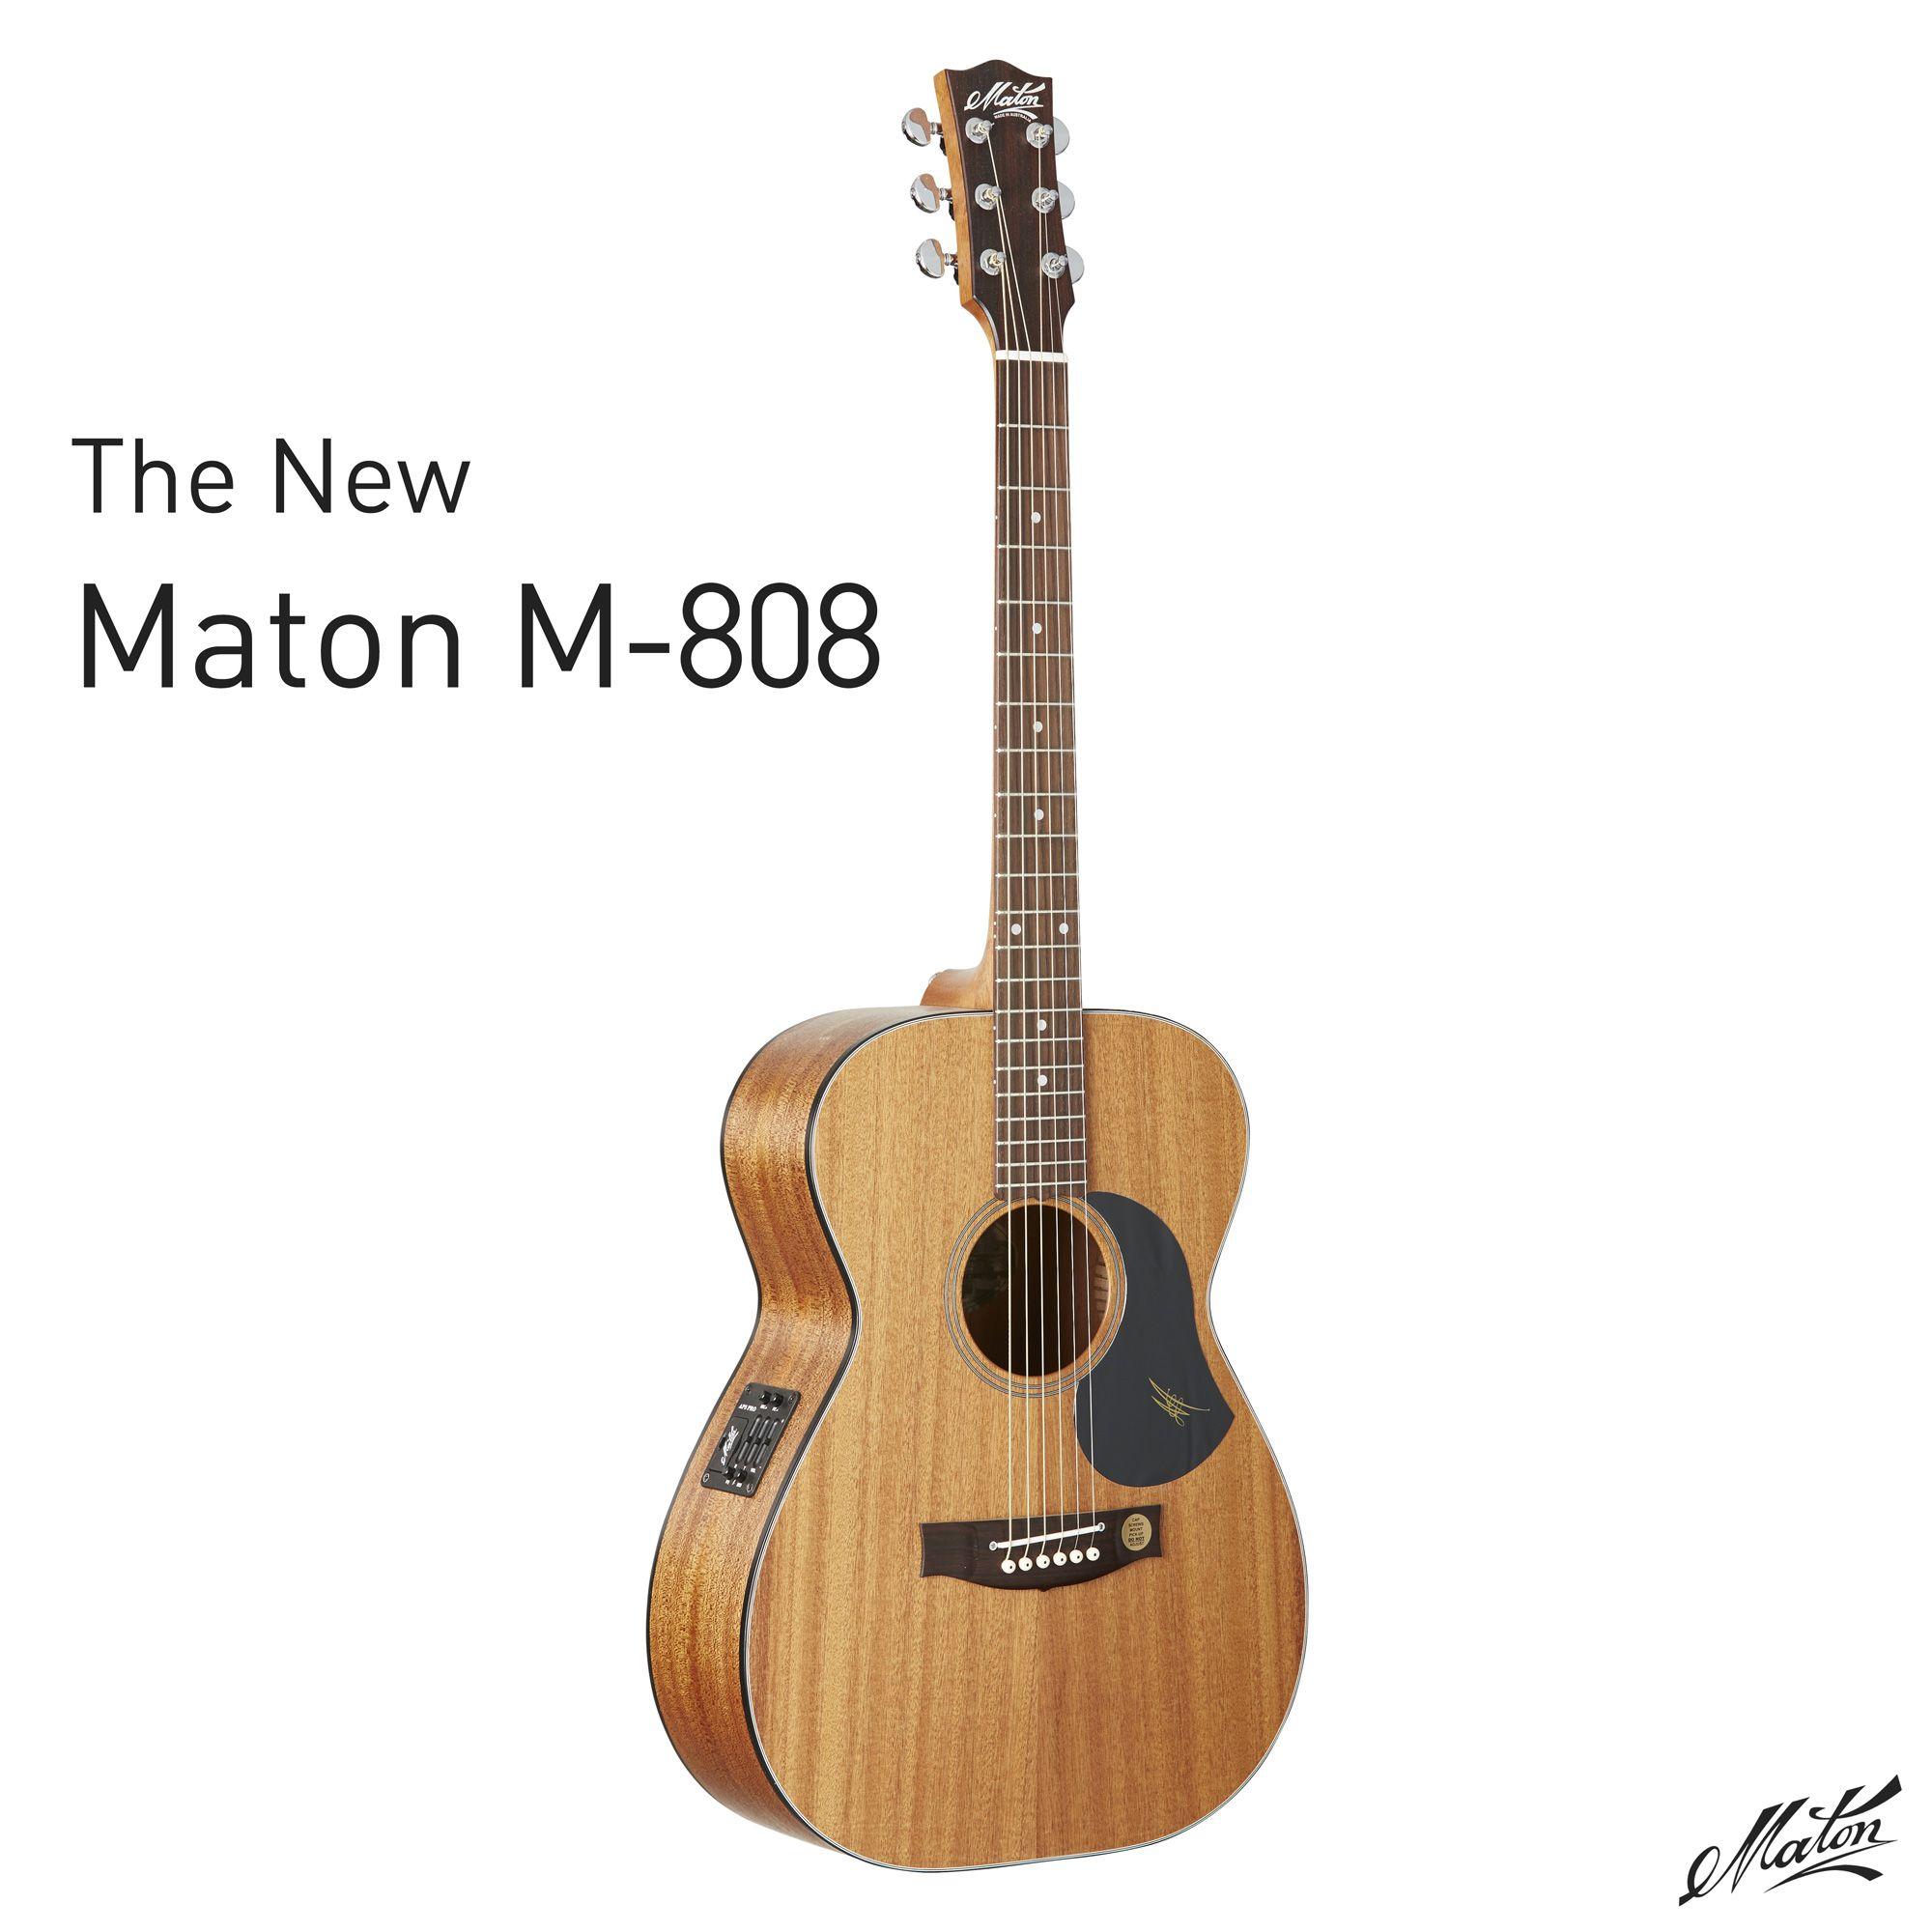 The New Maton M 808 Acoustic Guitar Handmade Mahogany For More Information Visit Http Go Maton Com Au Matonm808